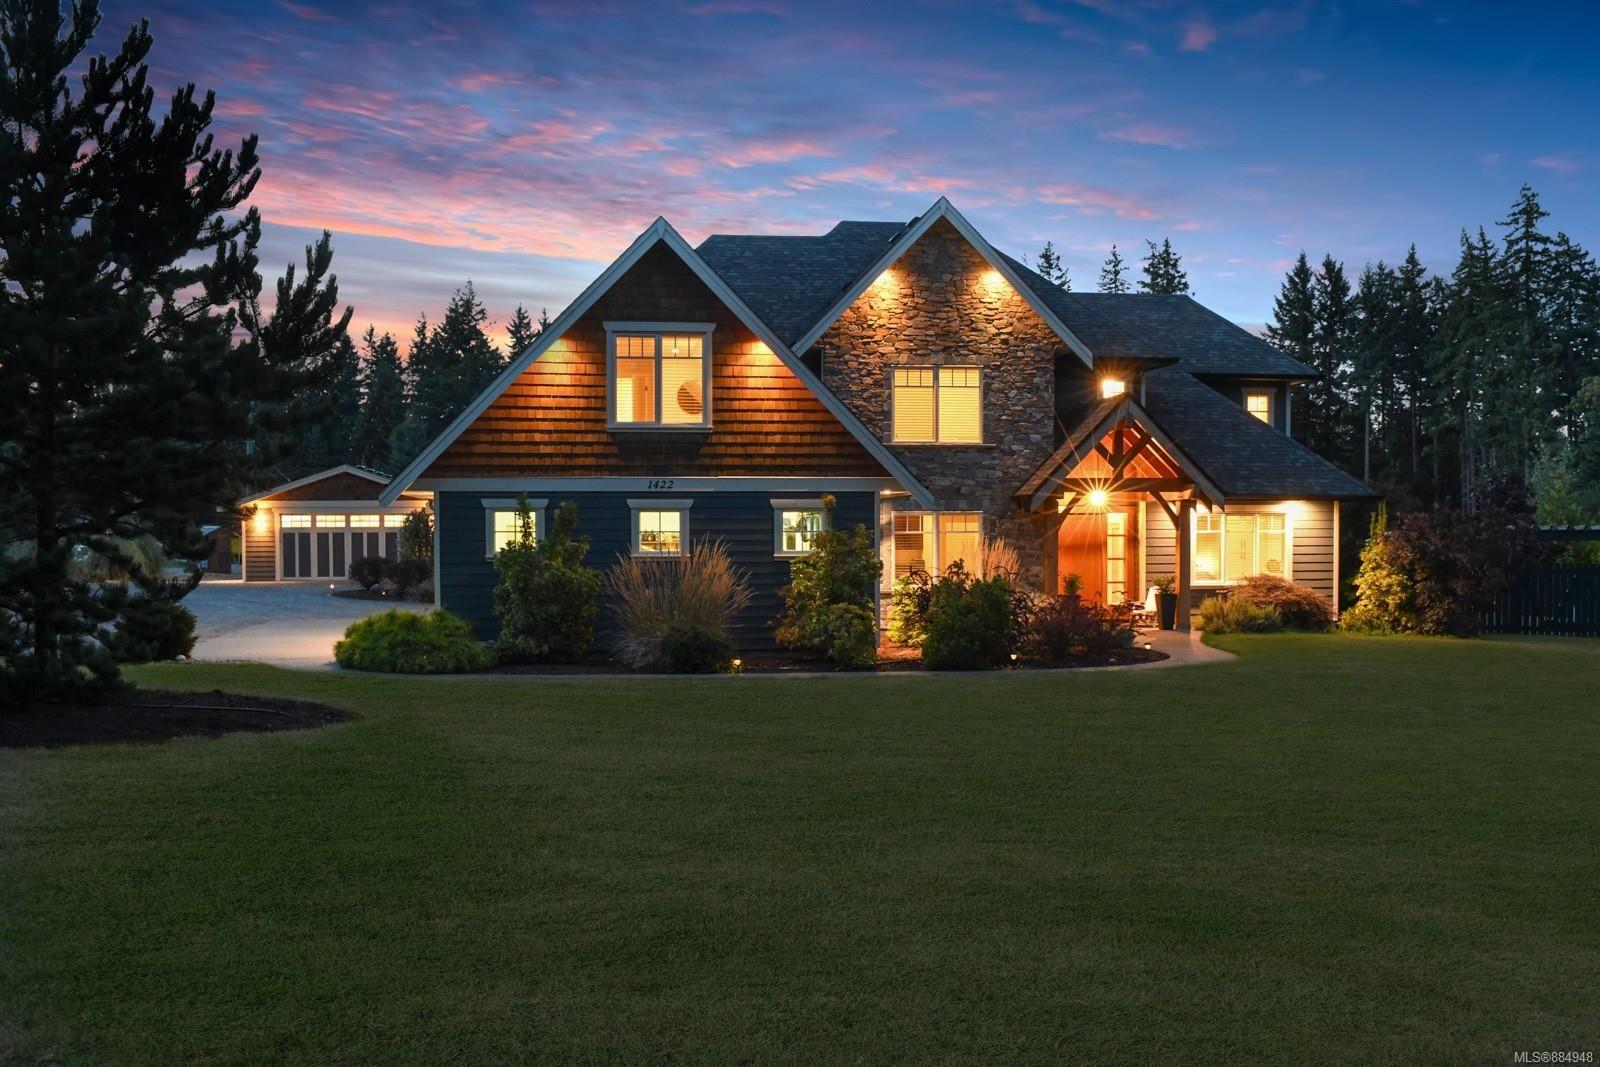 Main Photo: 1422 Lupin Dr in Comox: CV Comox Peninsula House for sale (Comox Valley)  : MLS®# 884948